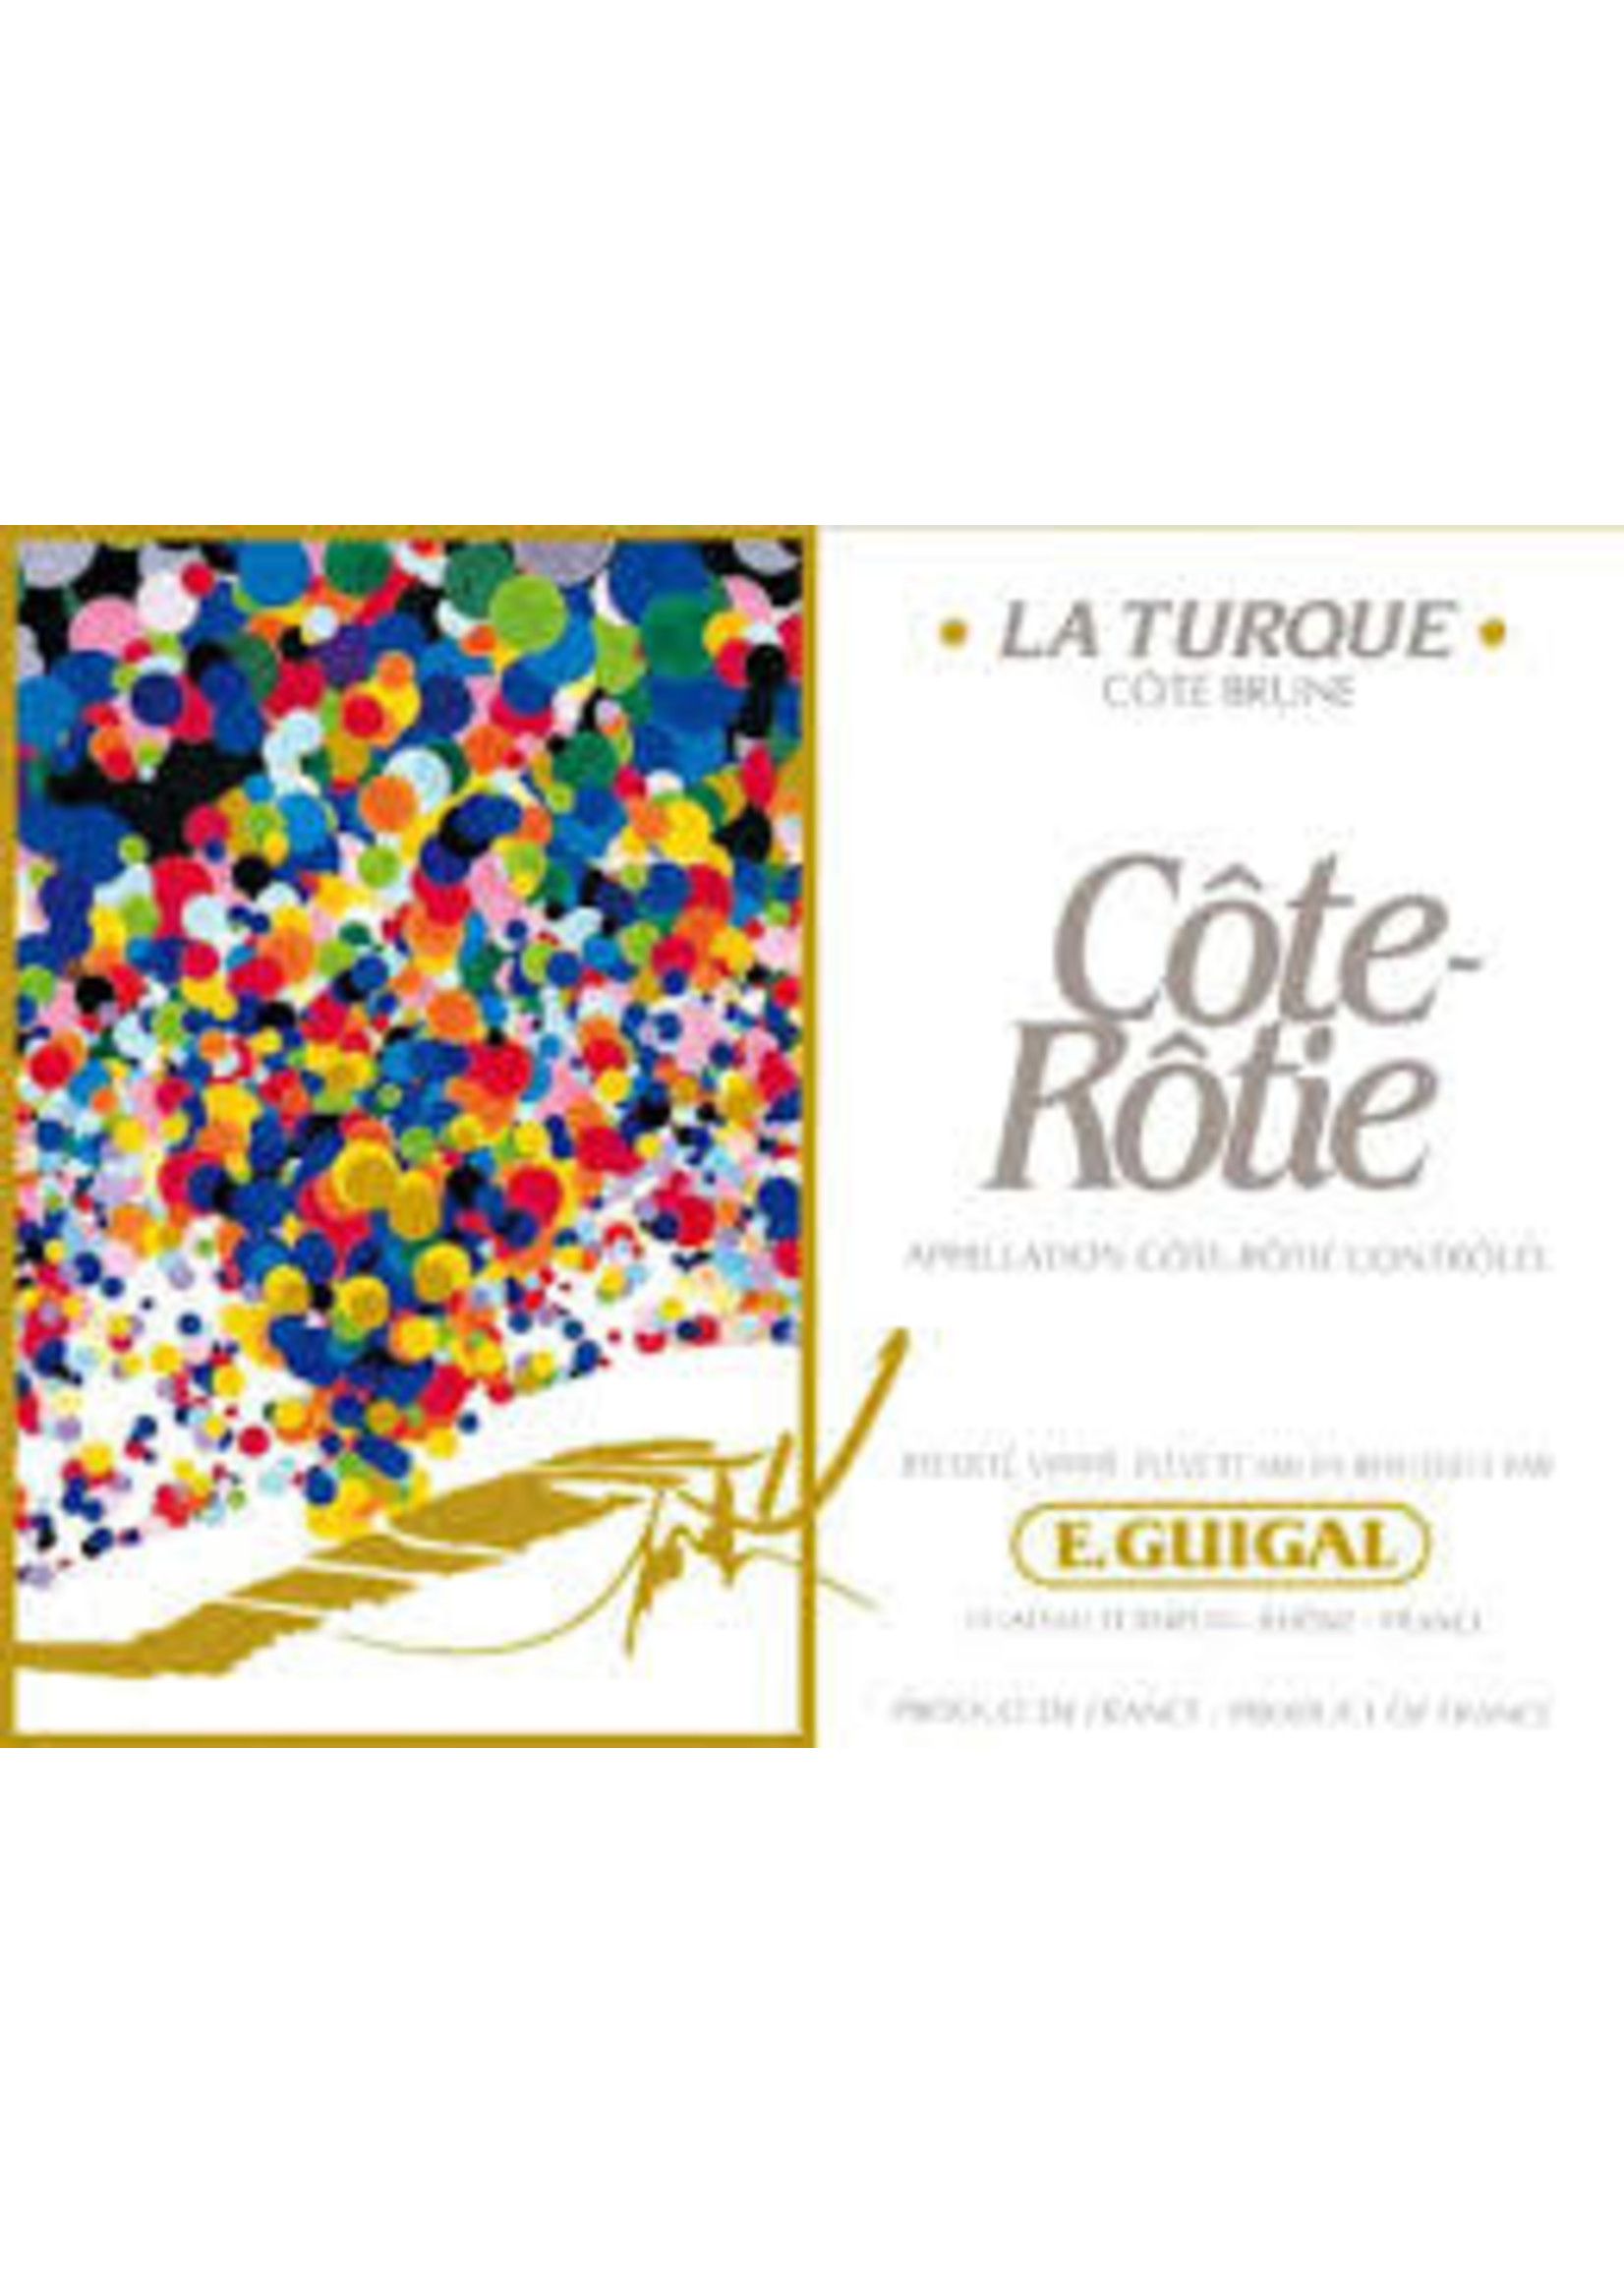 E. Guigal 2007 Cote Rotie La Turque 750ml [PRE-ARRIVAL]